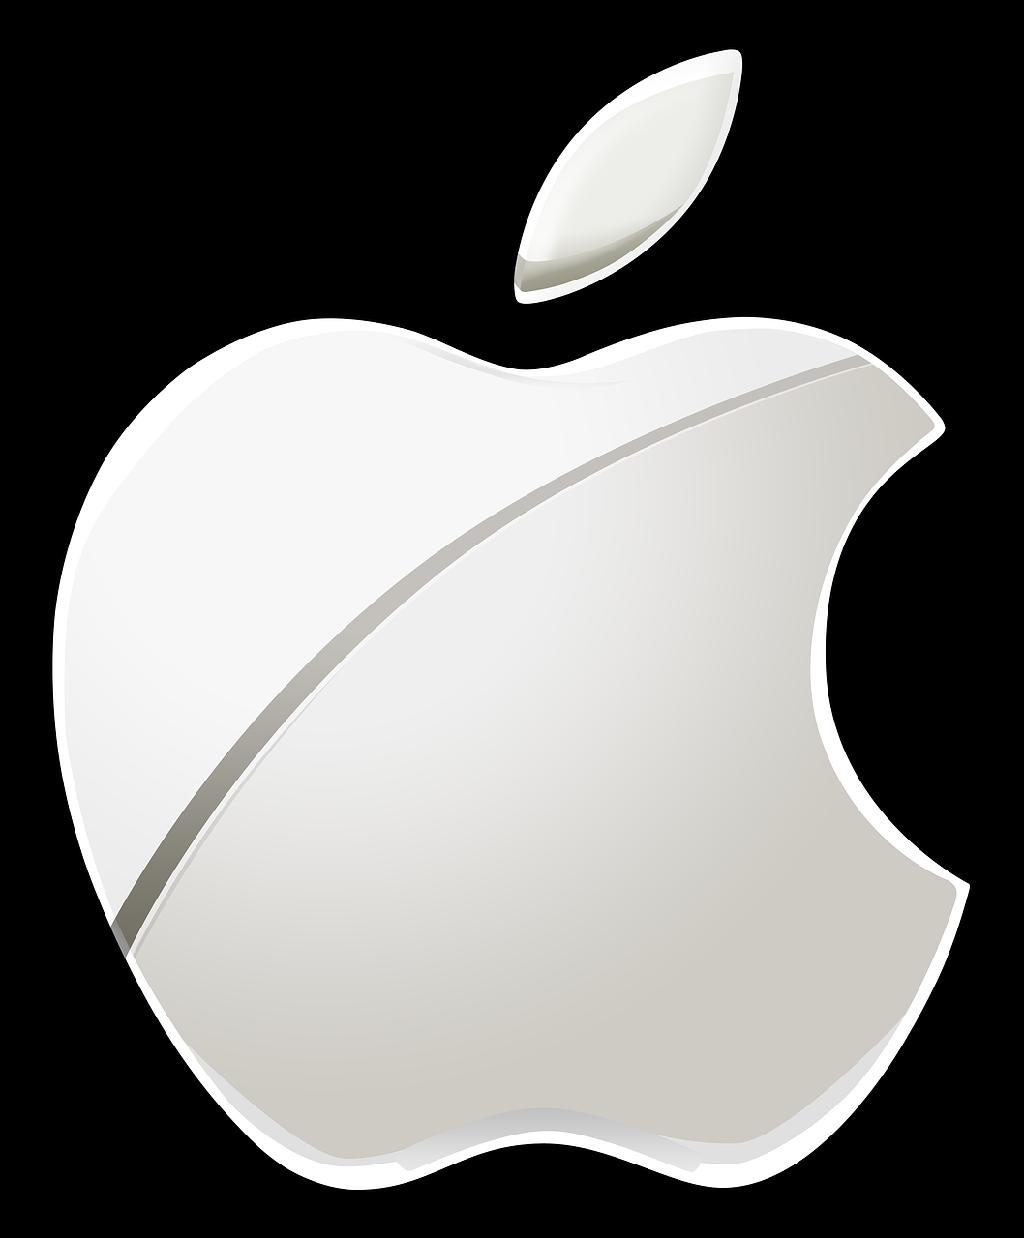 Apple inc logo Wallpaper